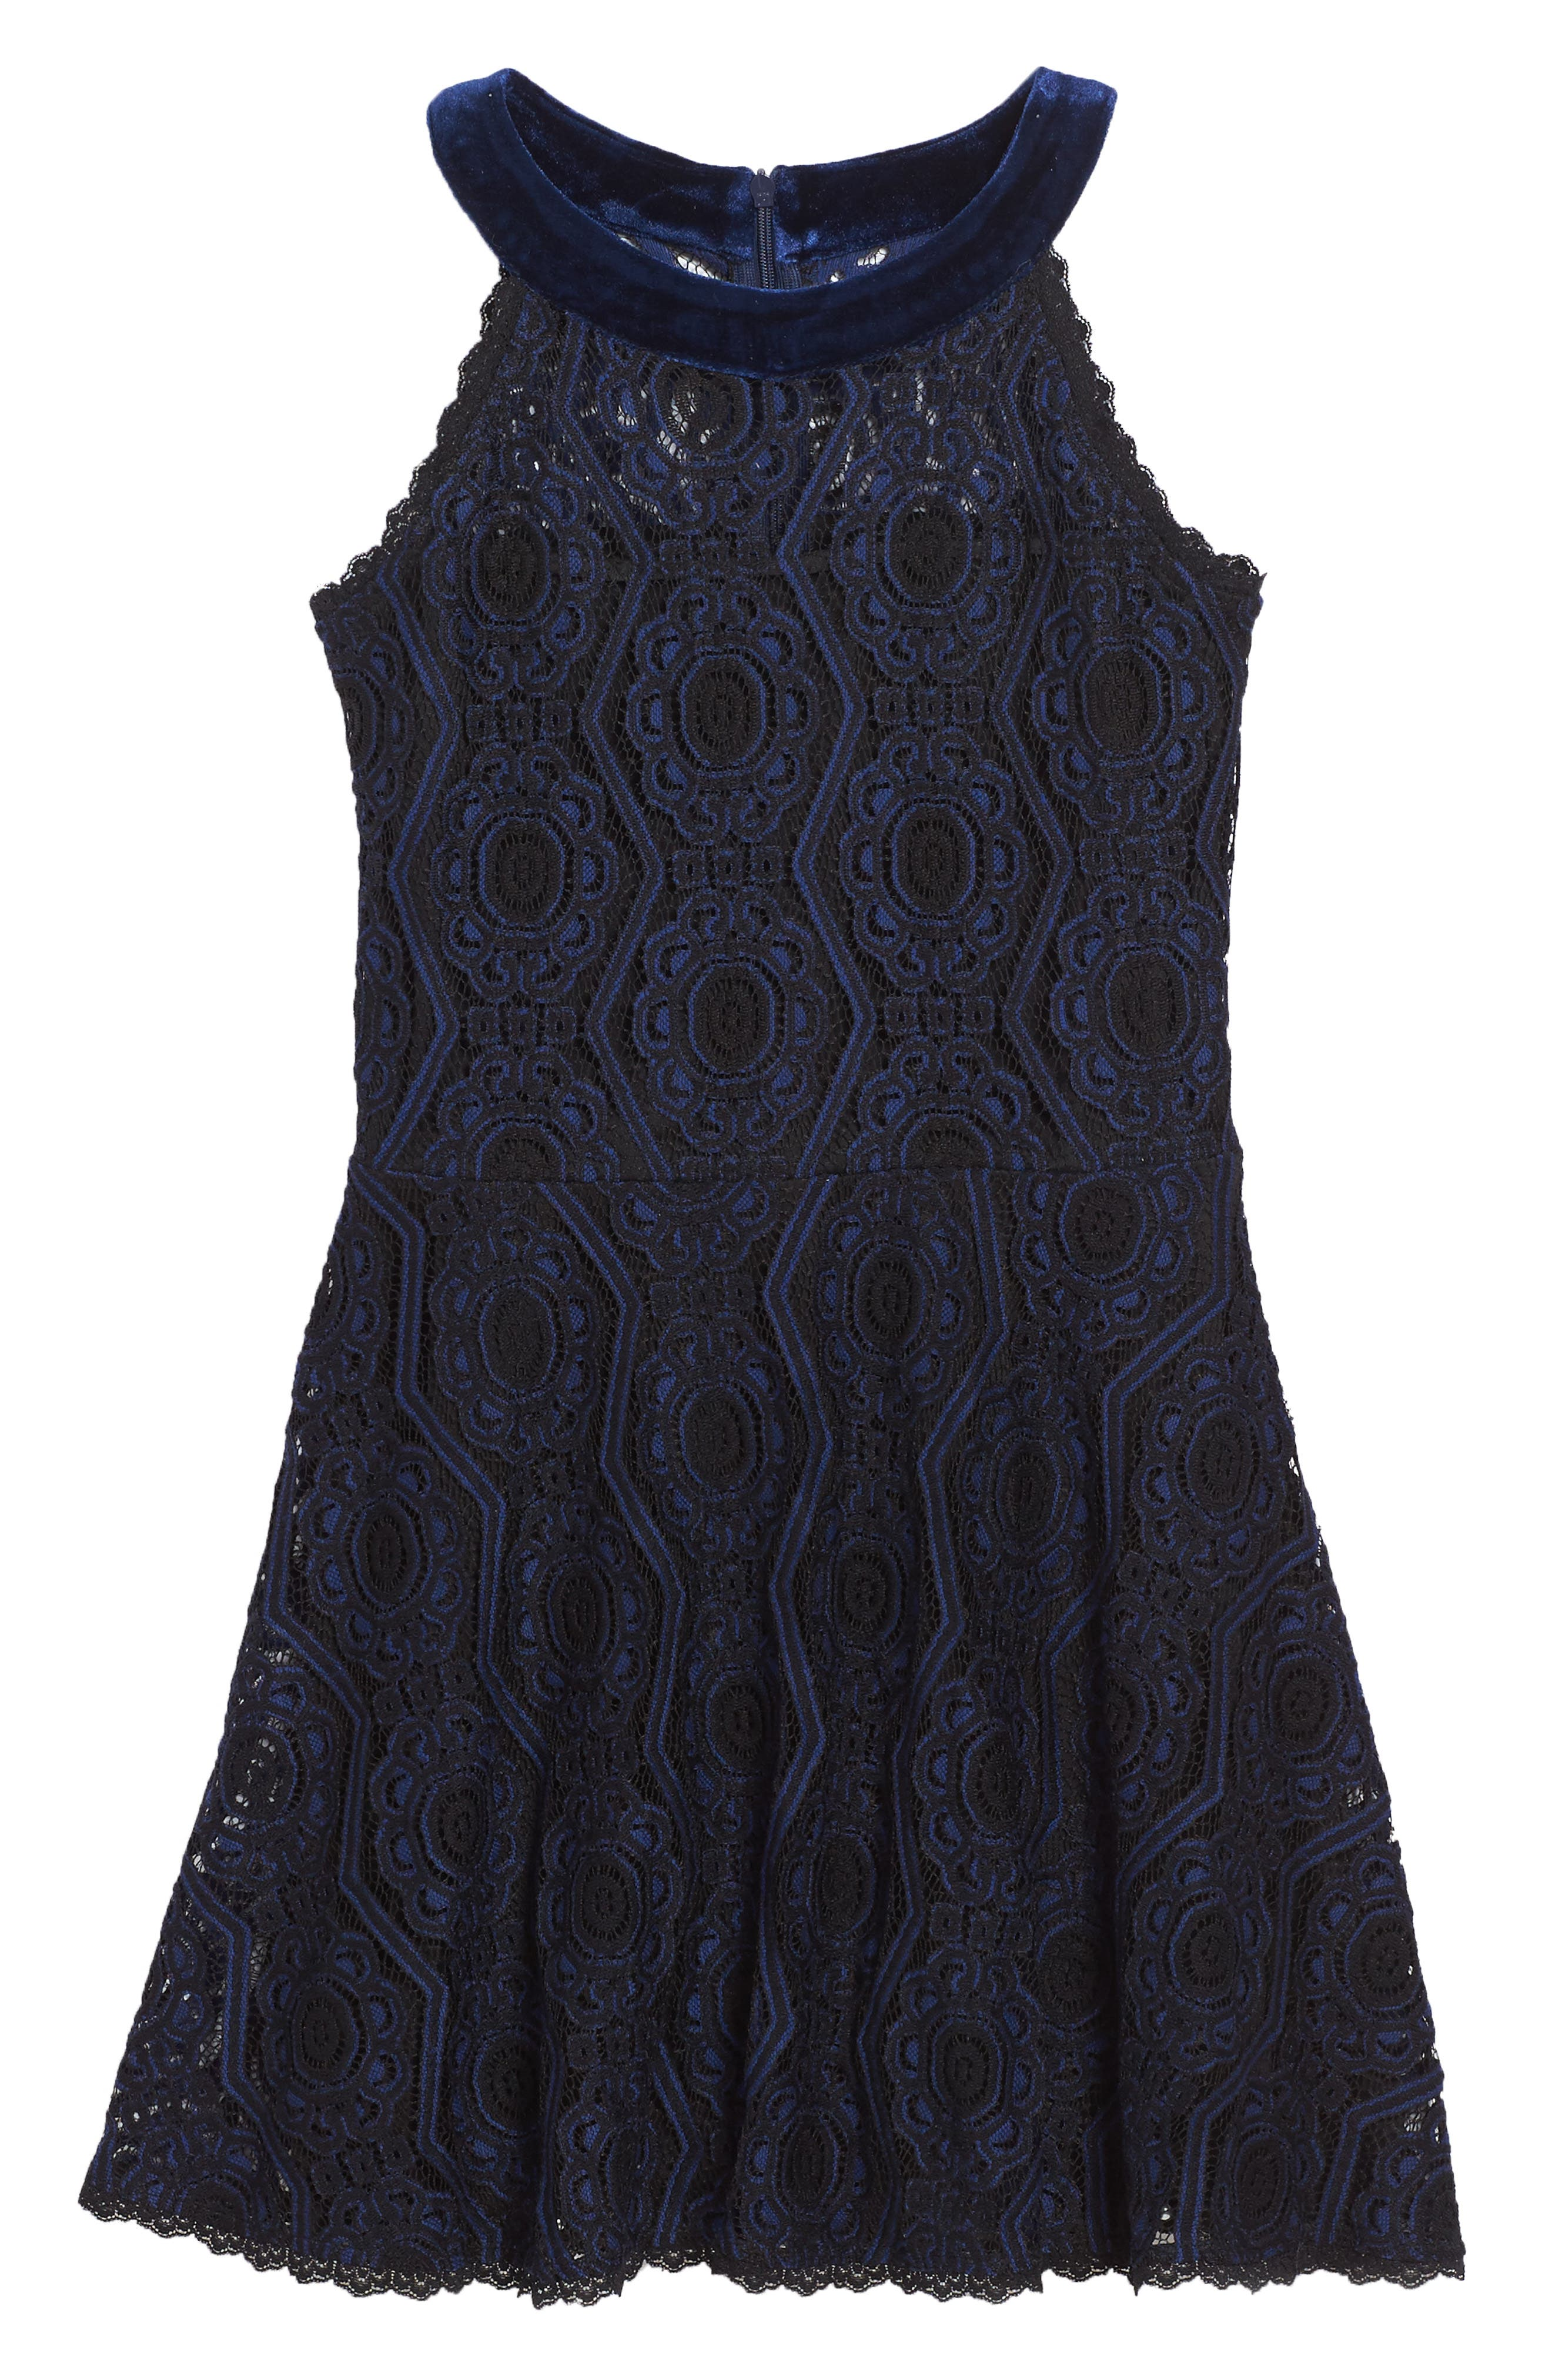 Lace Skater Dress,                             Main thumbnail 1, color,                             410